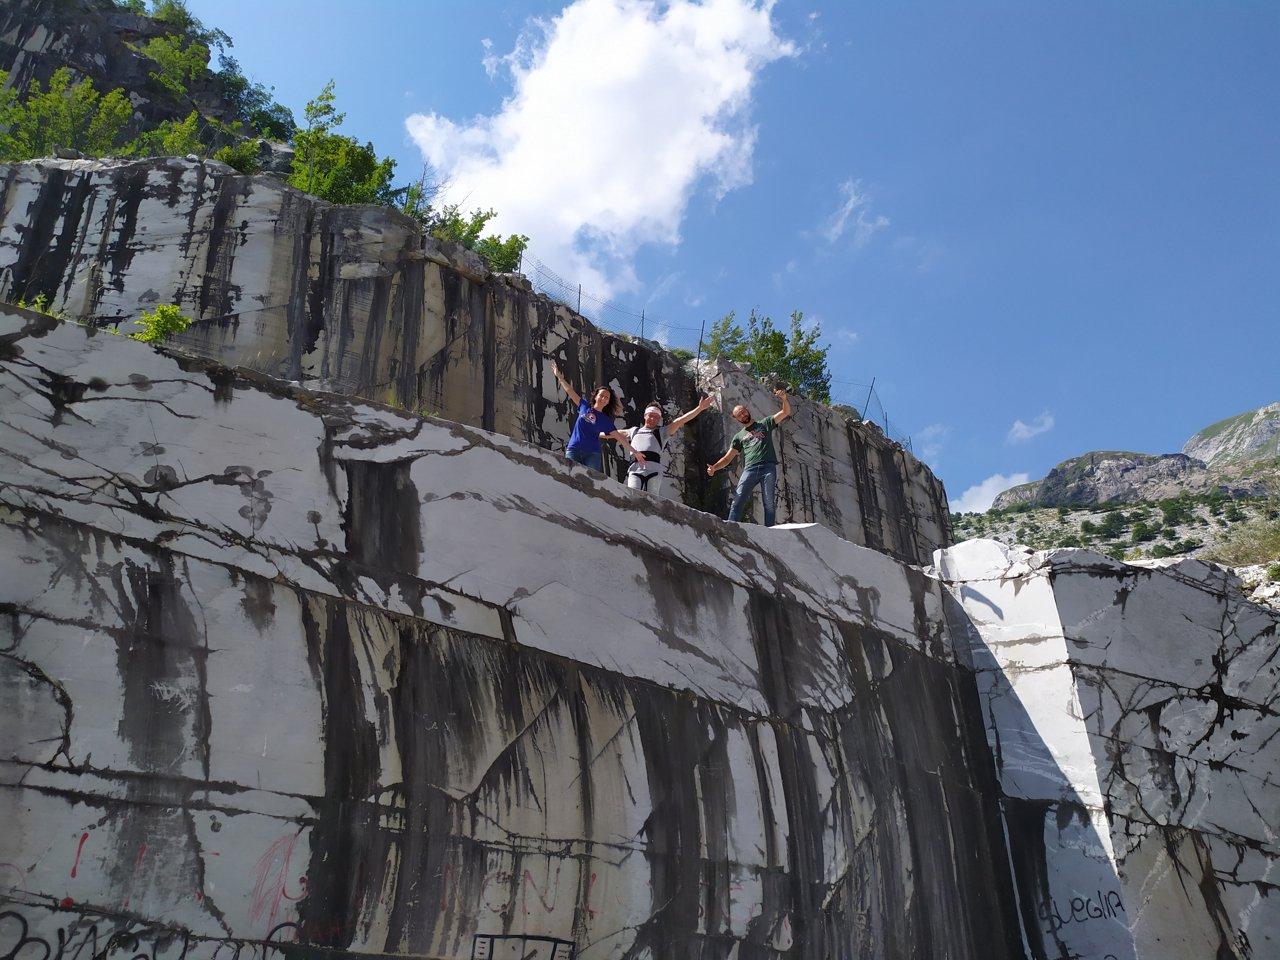 Alpi Apuane - Cave Henraux